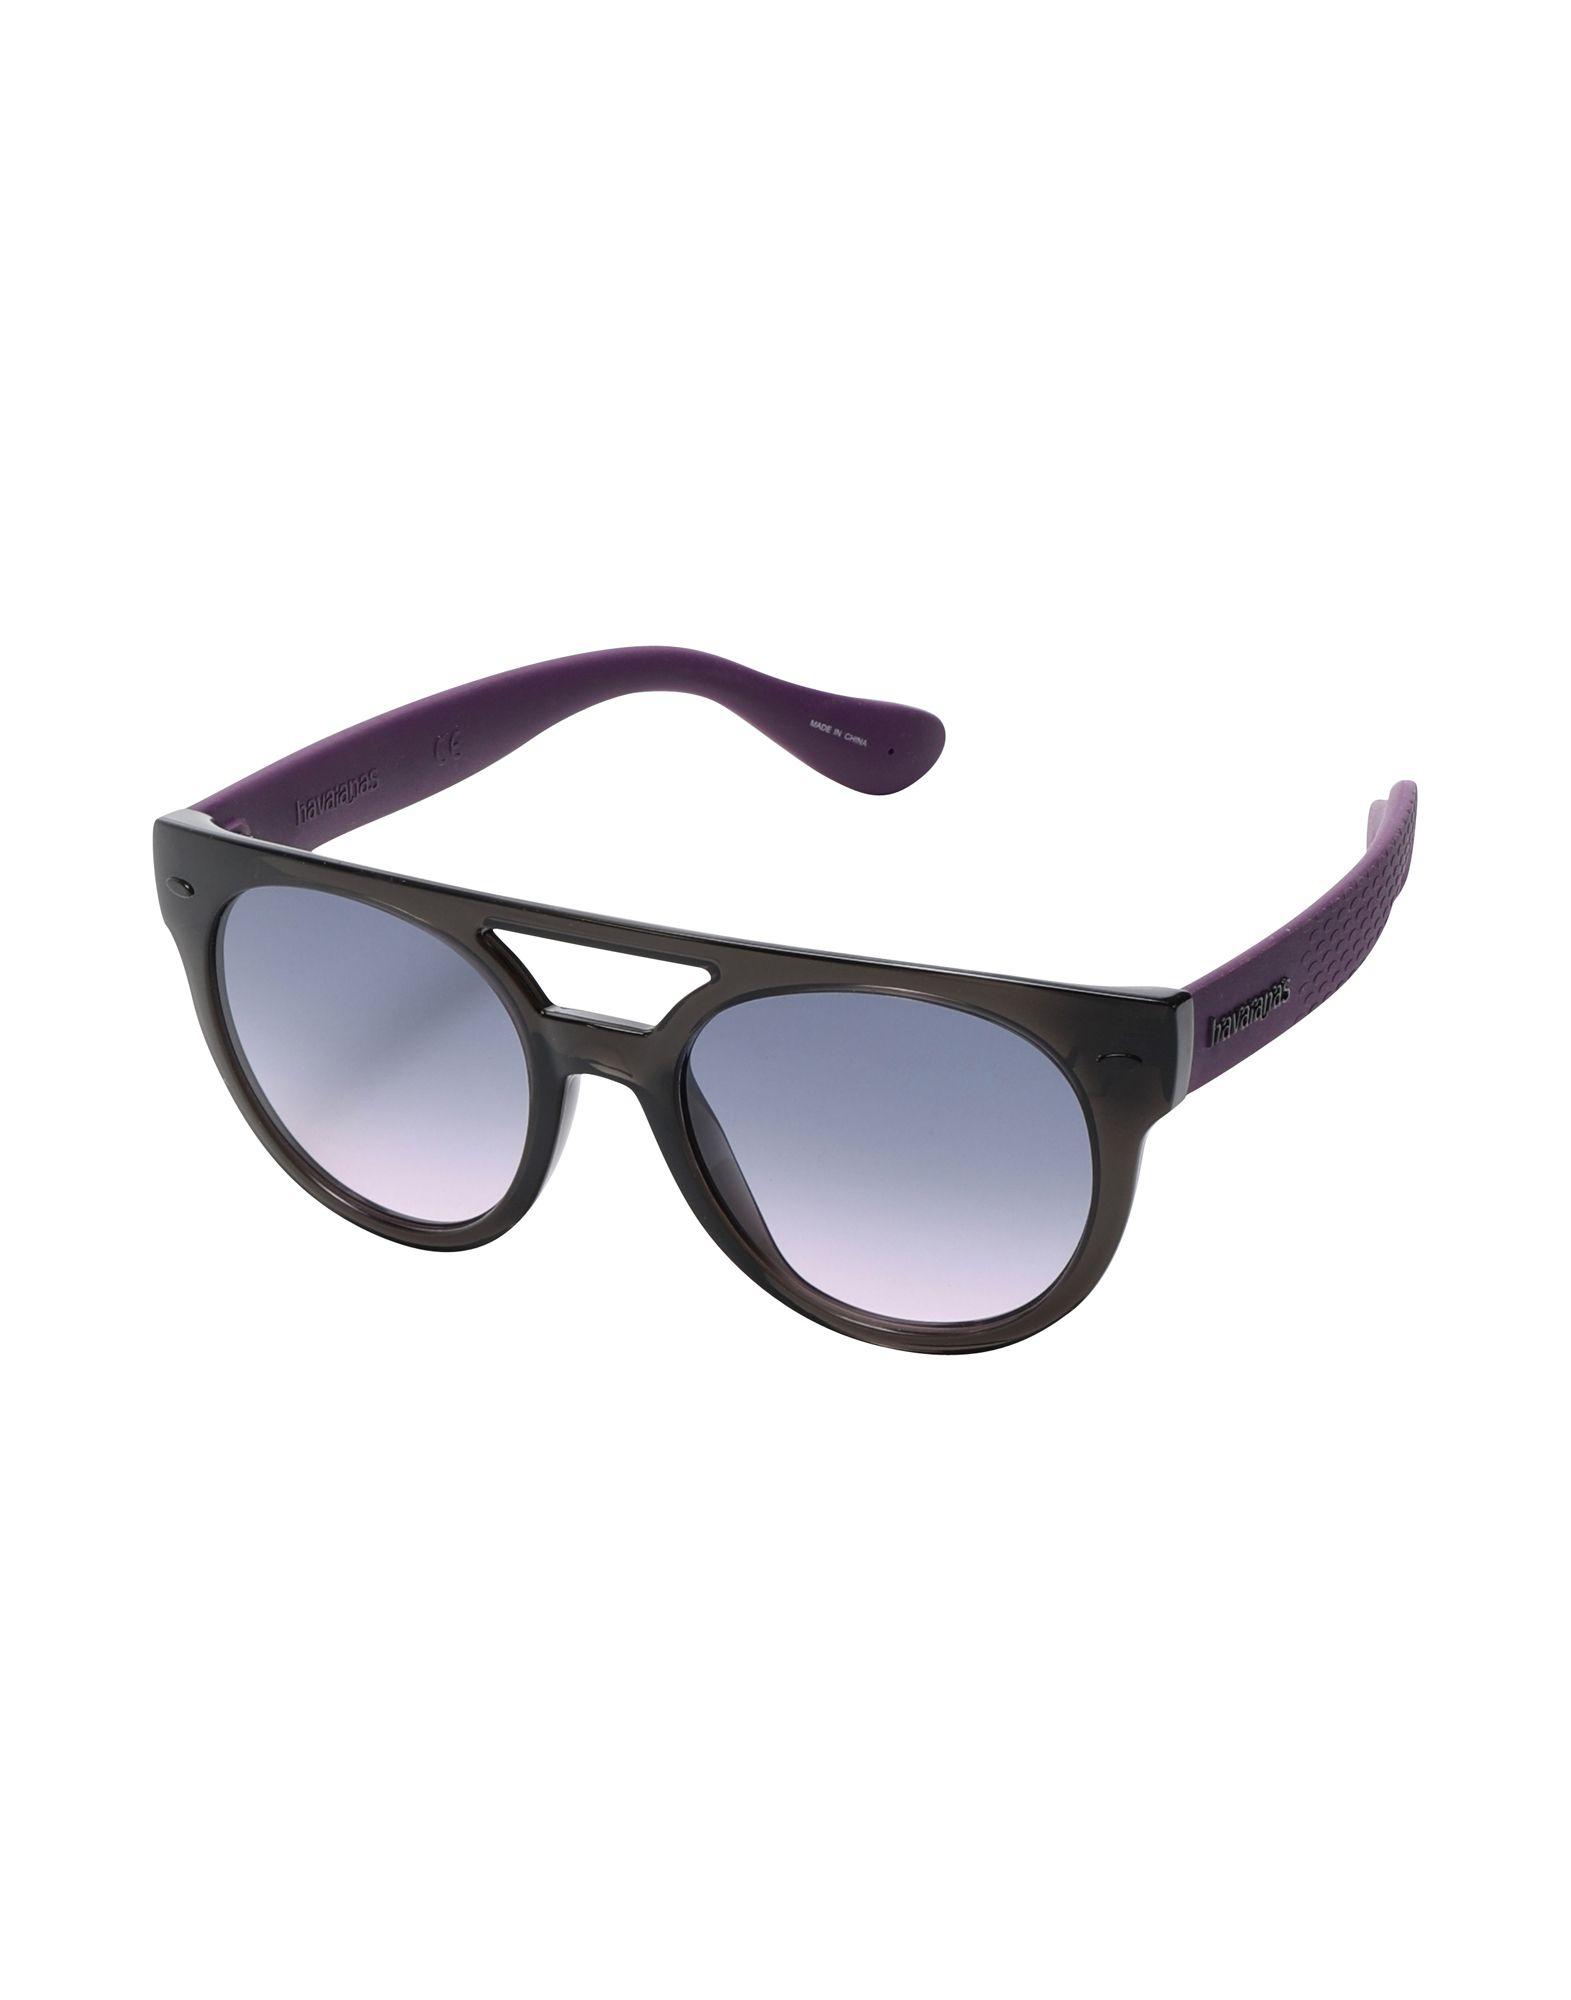 HAVAIANAS Солнечные очки web eyewear солнечные очки